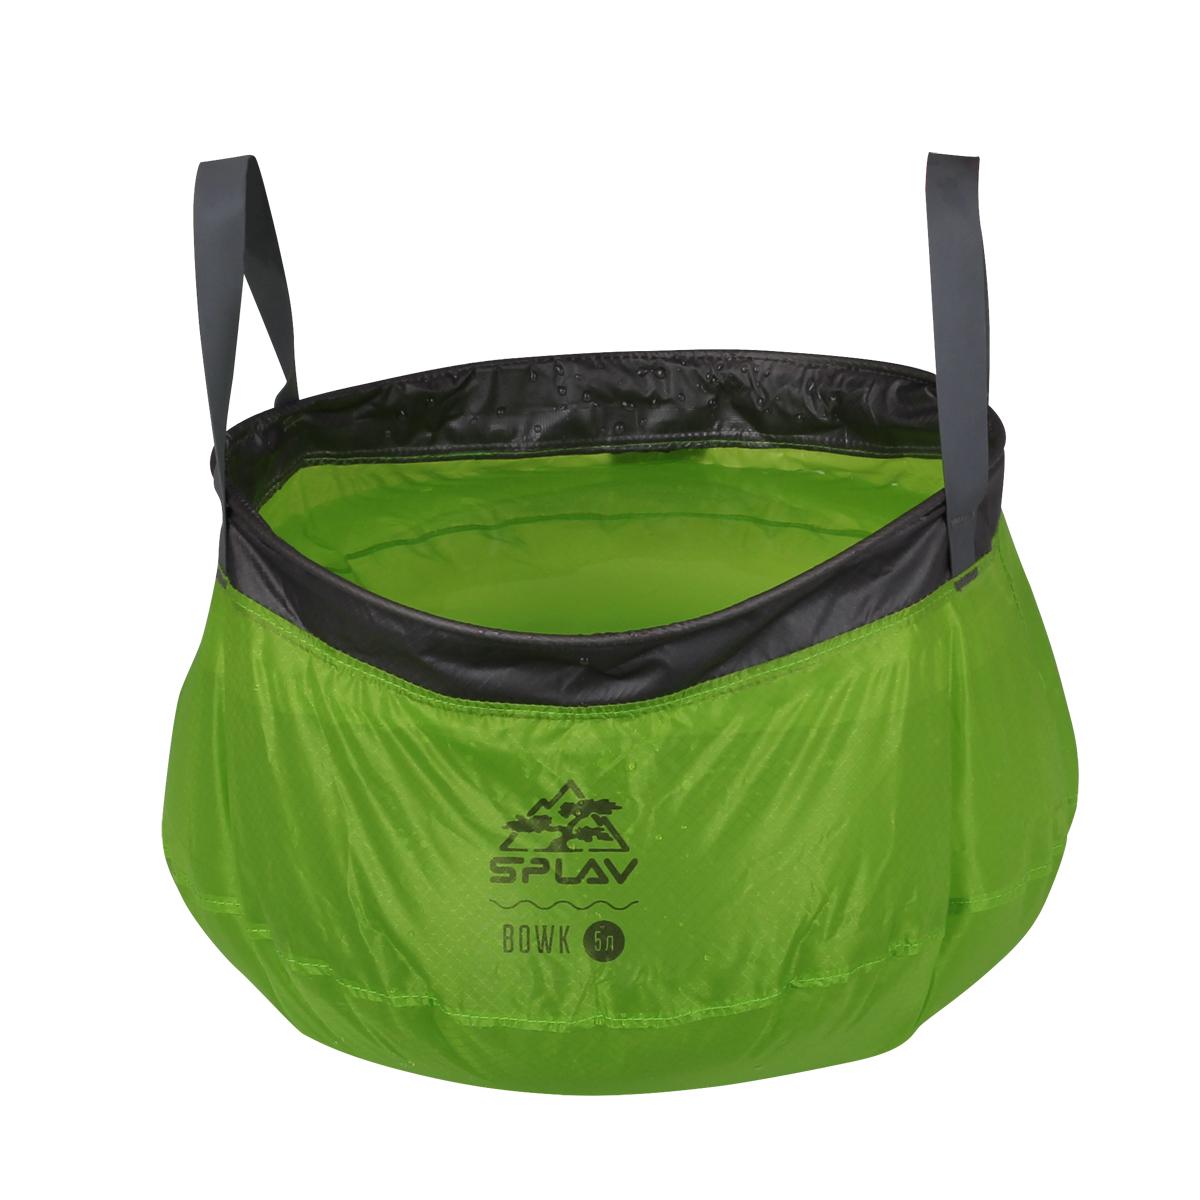 Ведро складное Bowk Сплав, цвет: зеленый, 5 л outventure складное ведро outventure 10 л